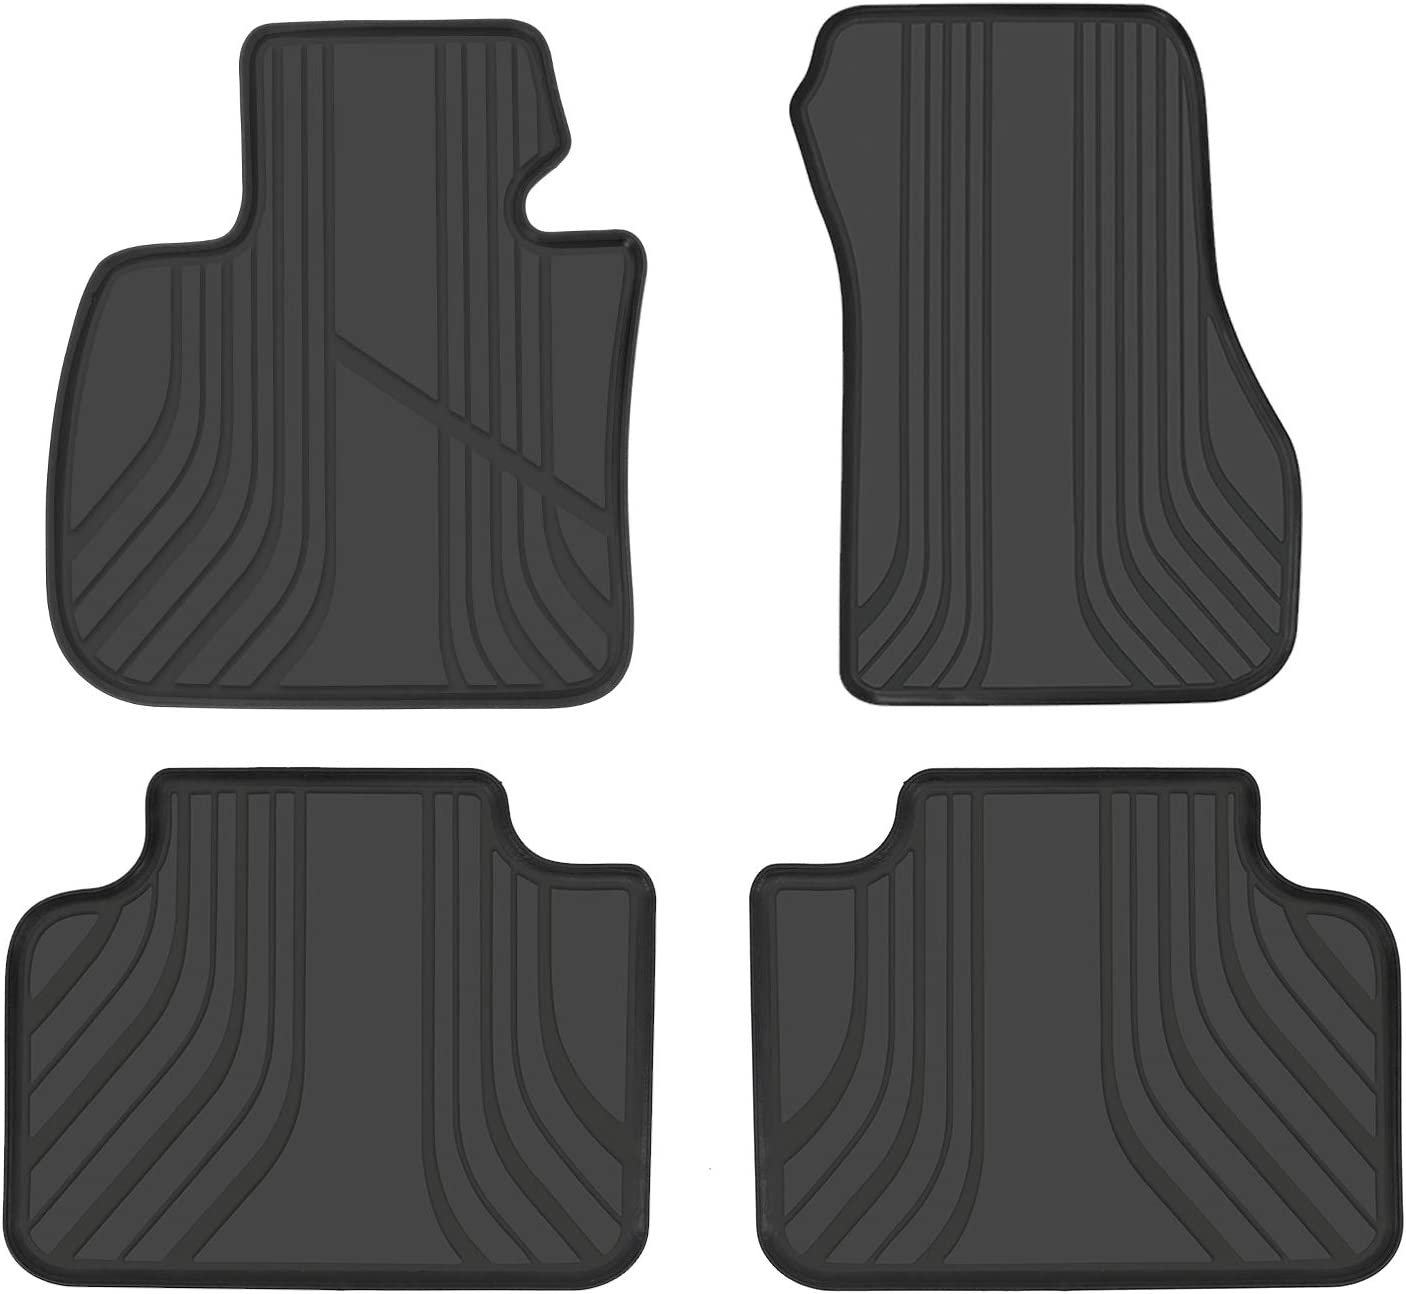 SMARTLINER All Weather Custom Fit Floor Mats 1st Row Liner Set Black for 2018-2020 BMW X3 and X4